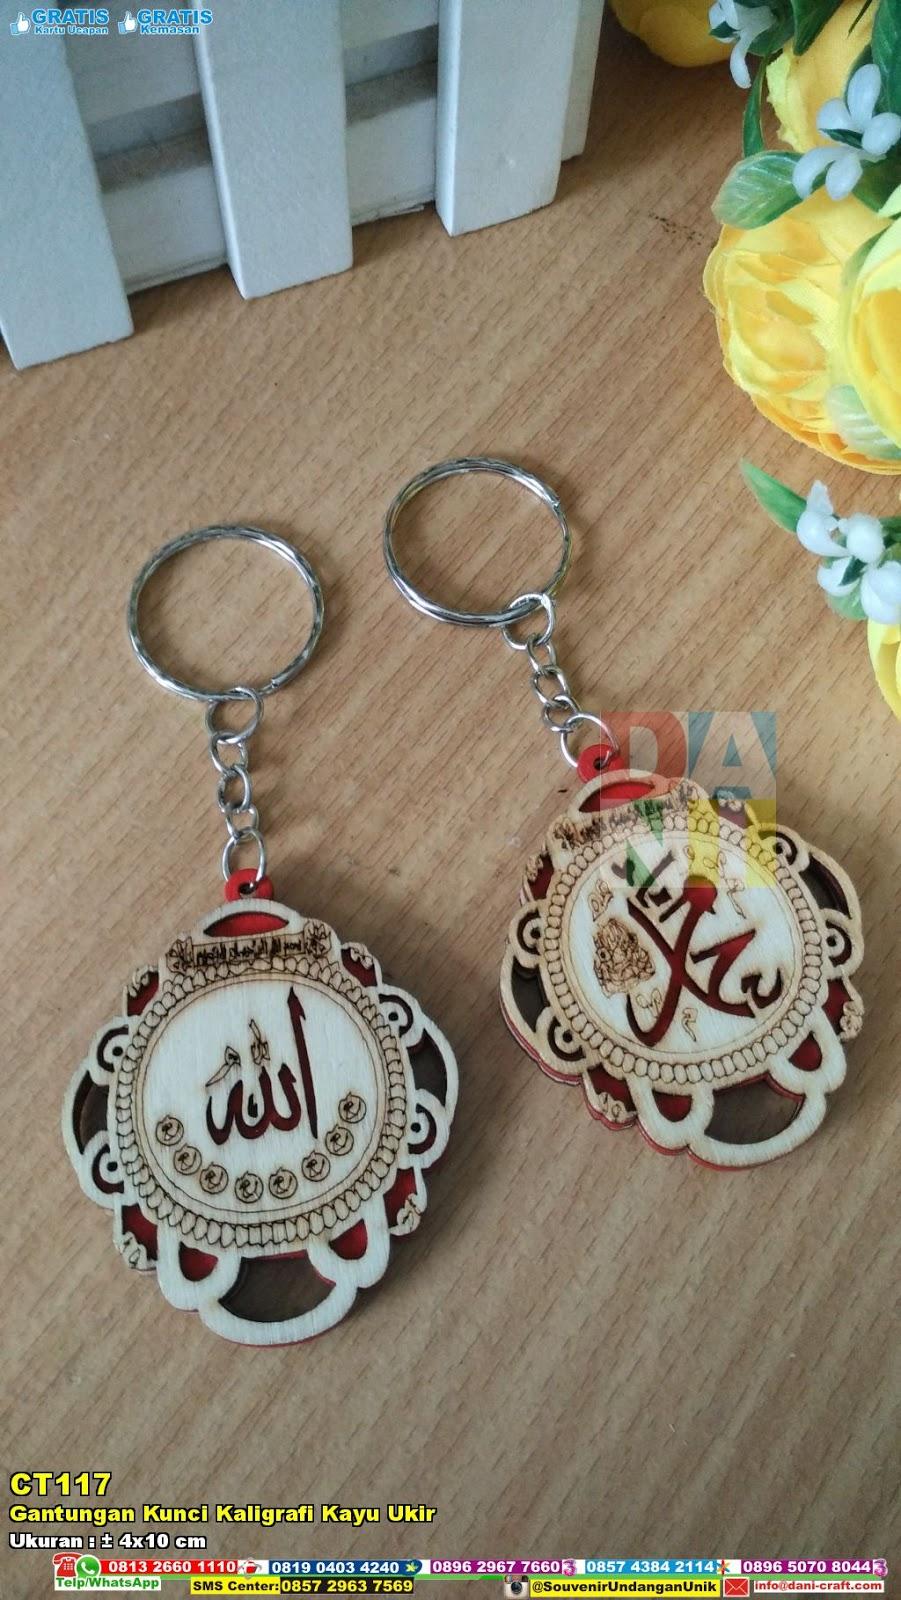 Gantungan Kunci Kaligrafi Kayu Ukir  Souvenir Pernikahan